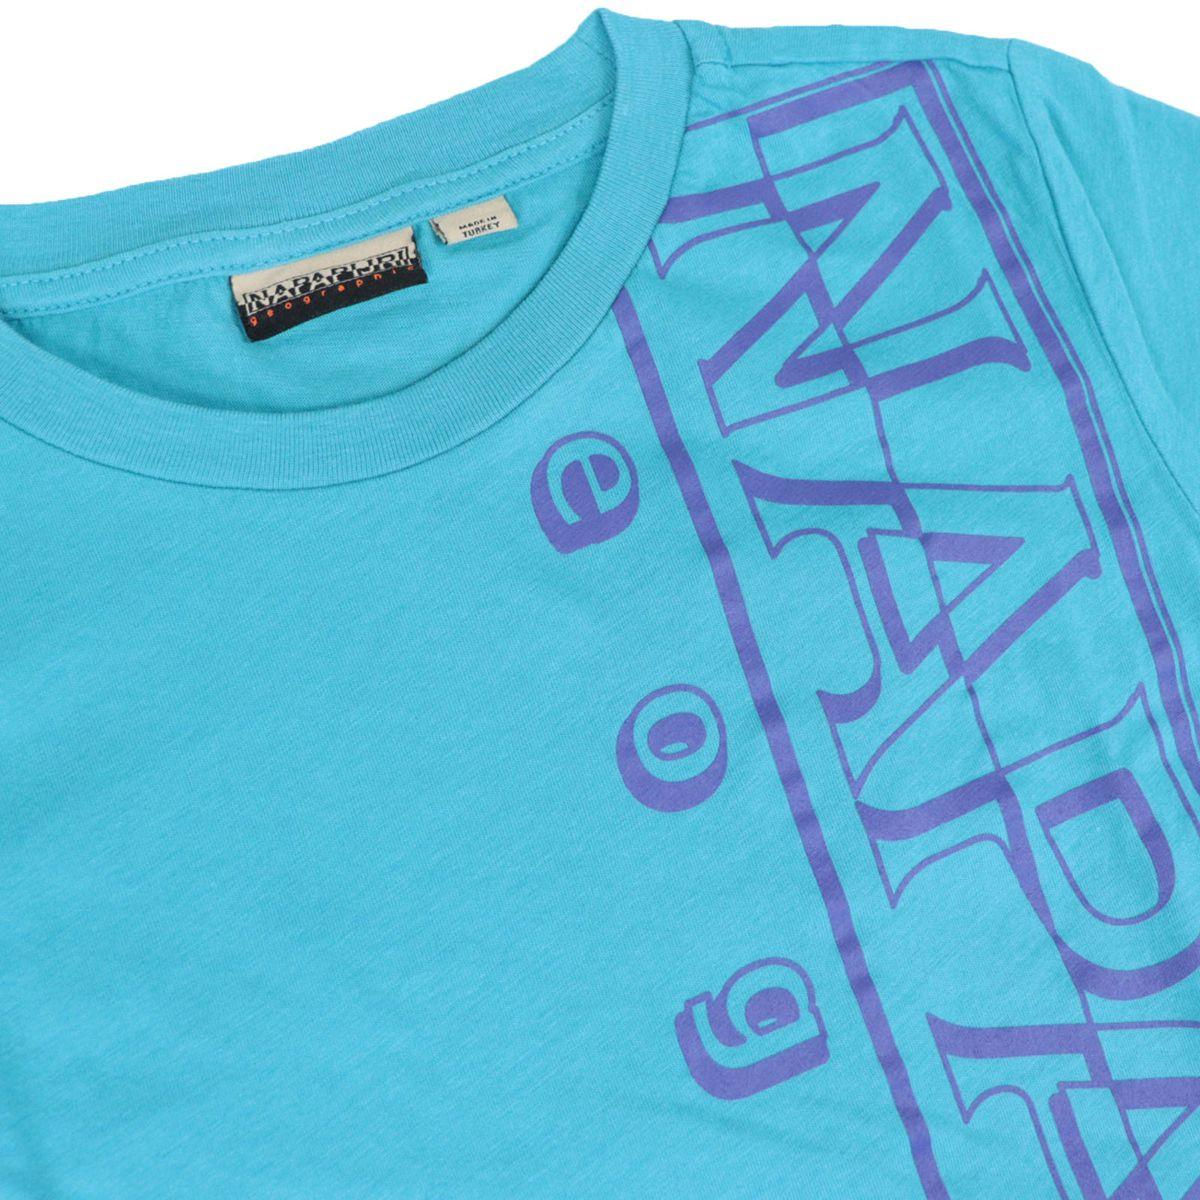 Short-sleeved cotton T-shirt with large vertical logo Turquoise NAPAPIJRI